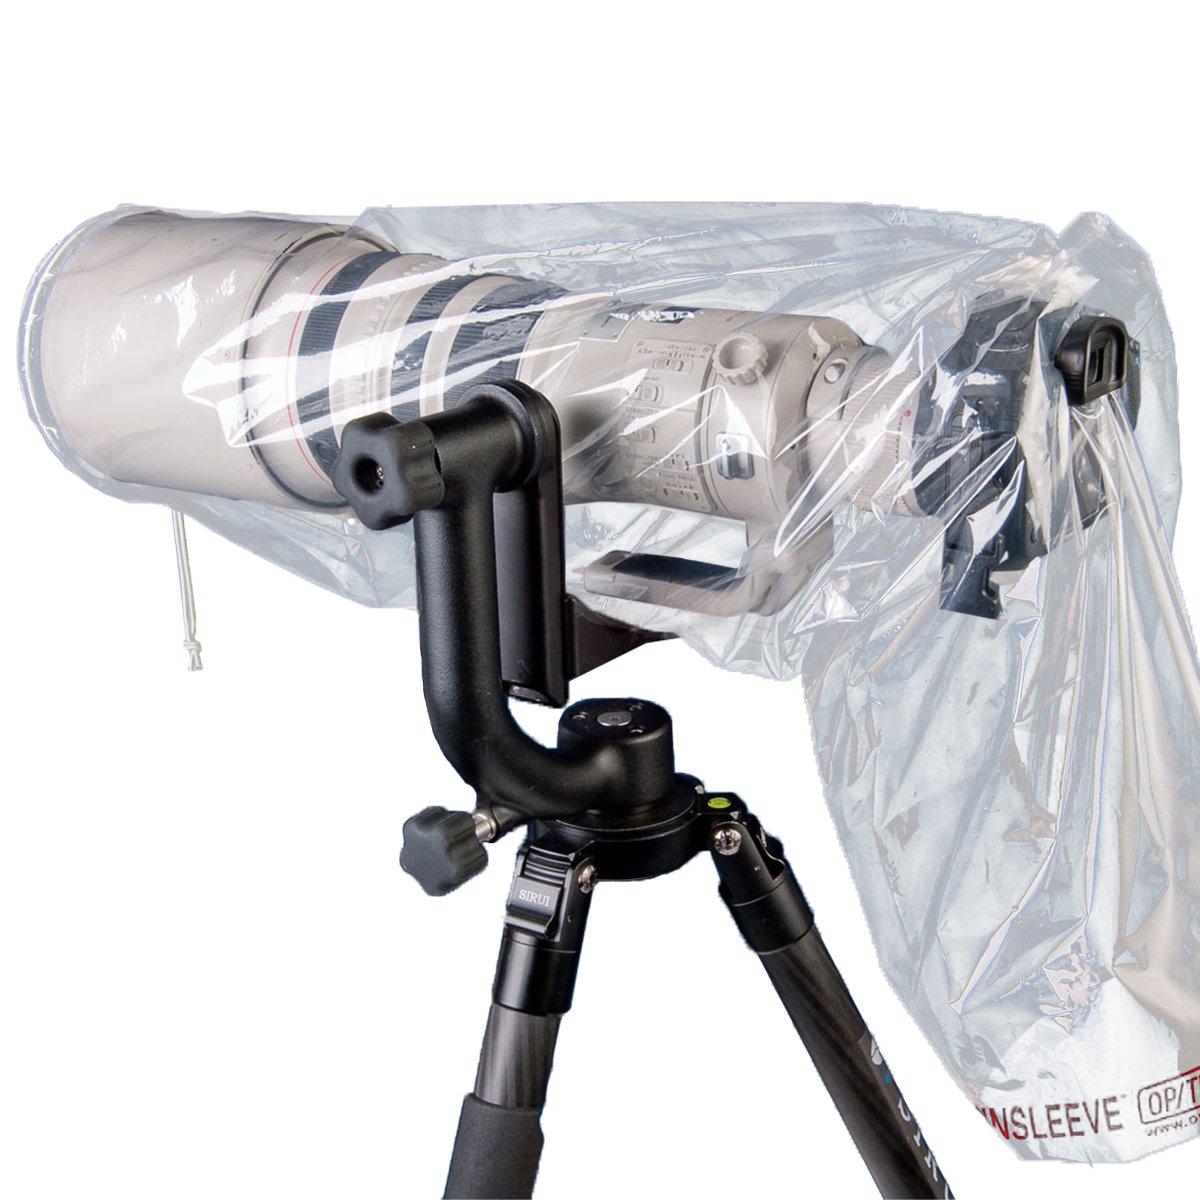 OP/TECH USA 9001252 Mega Cover Rainsleeve (Clear)